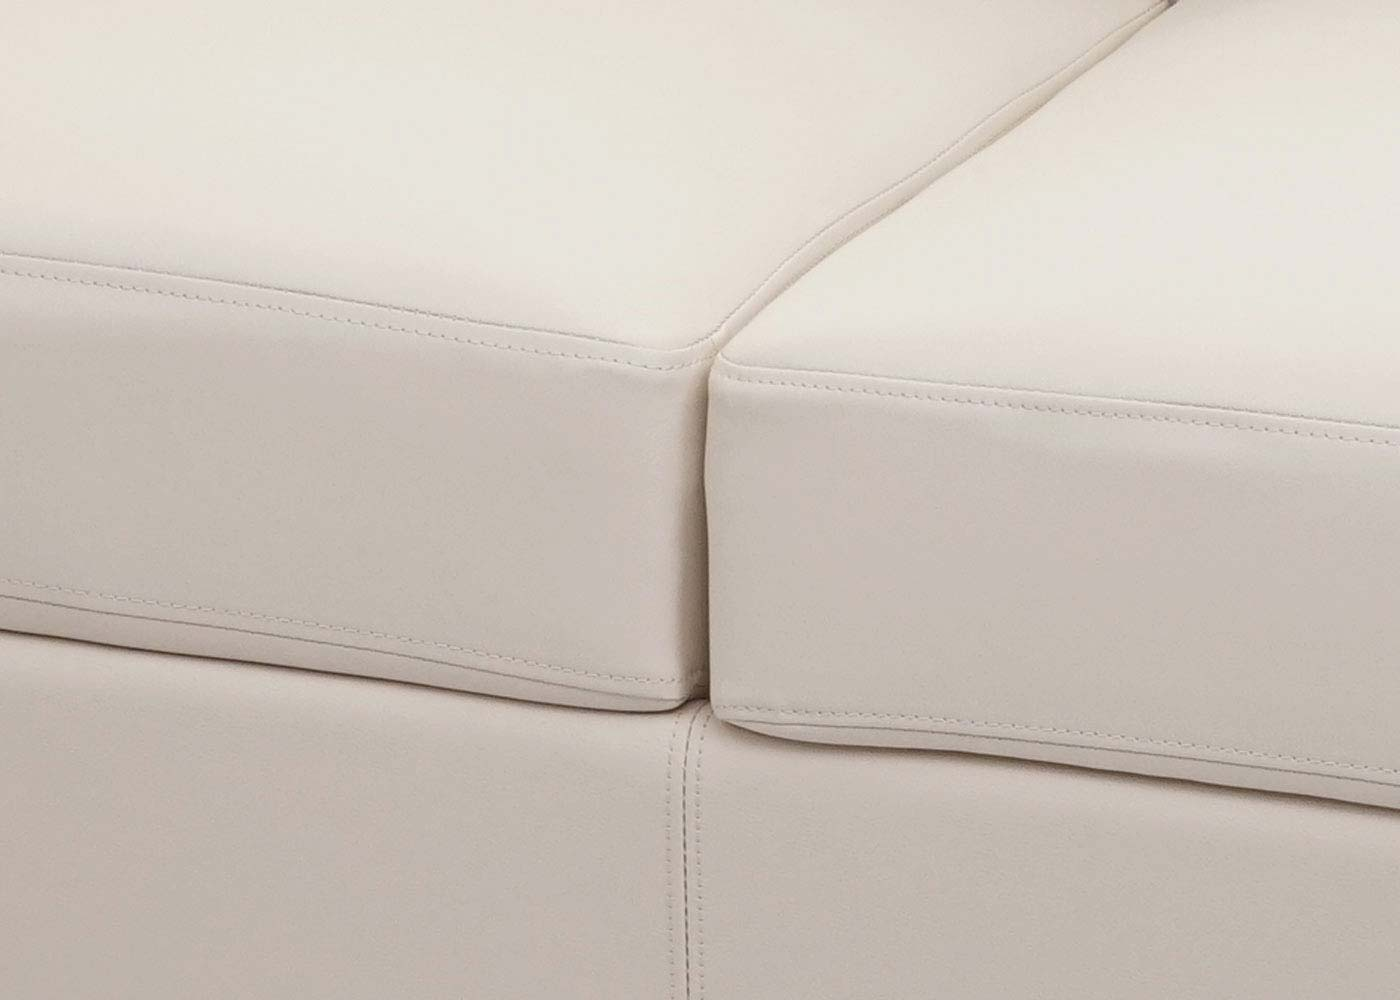 2er Sofa Couch Loungesofa Lille Detailansicht Polsterung